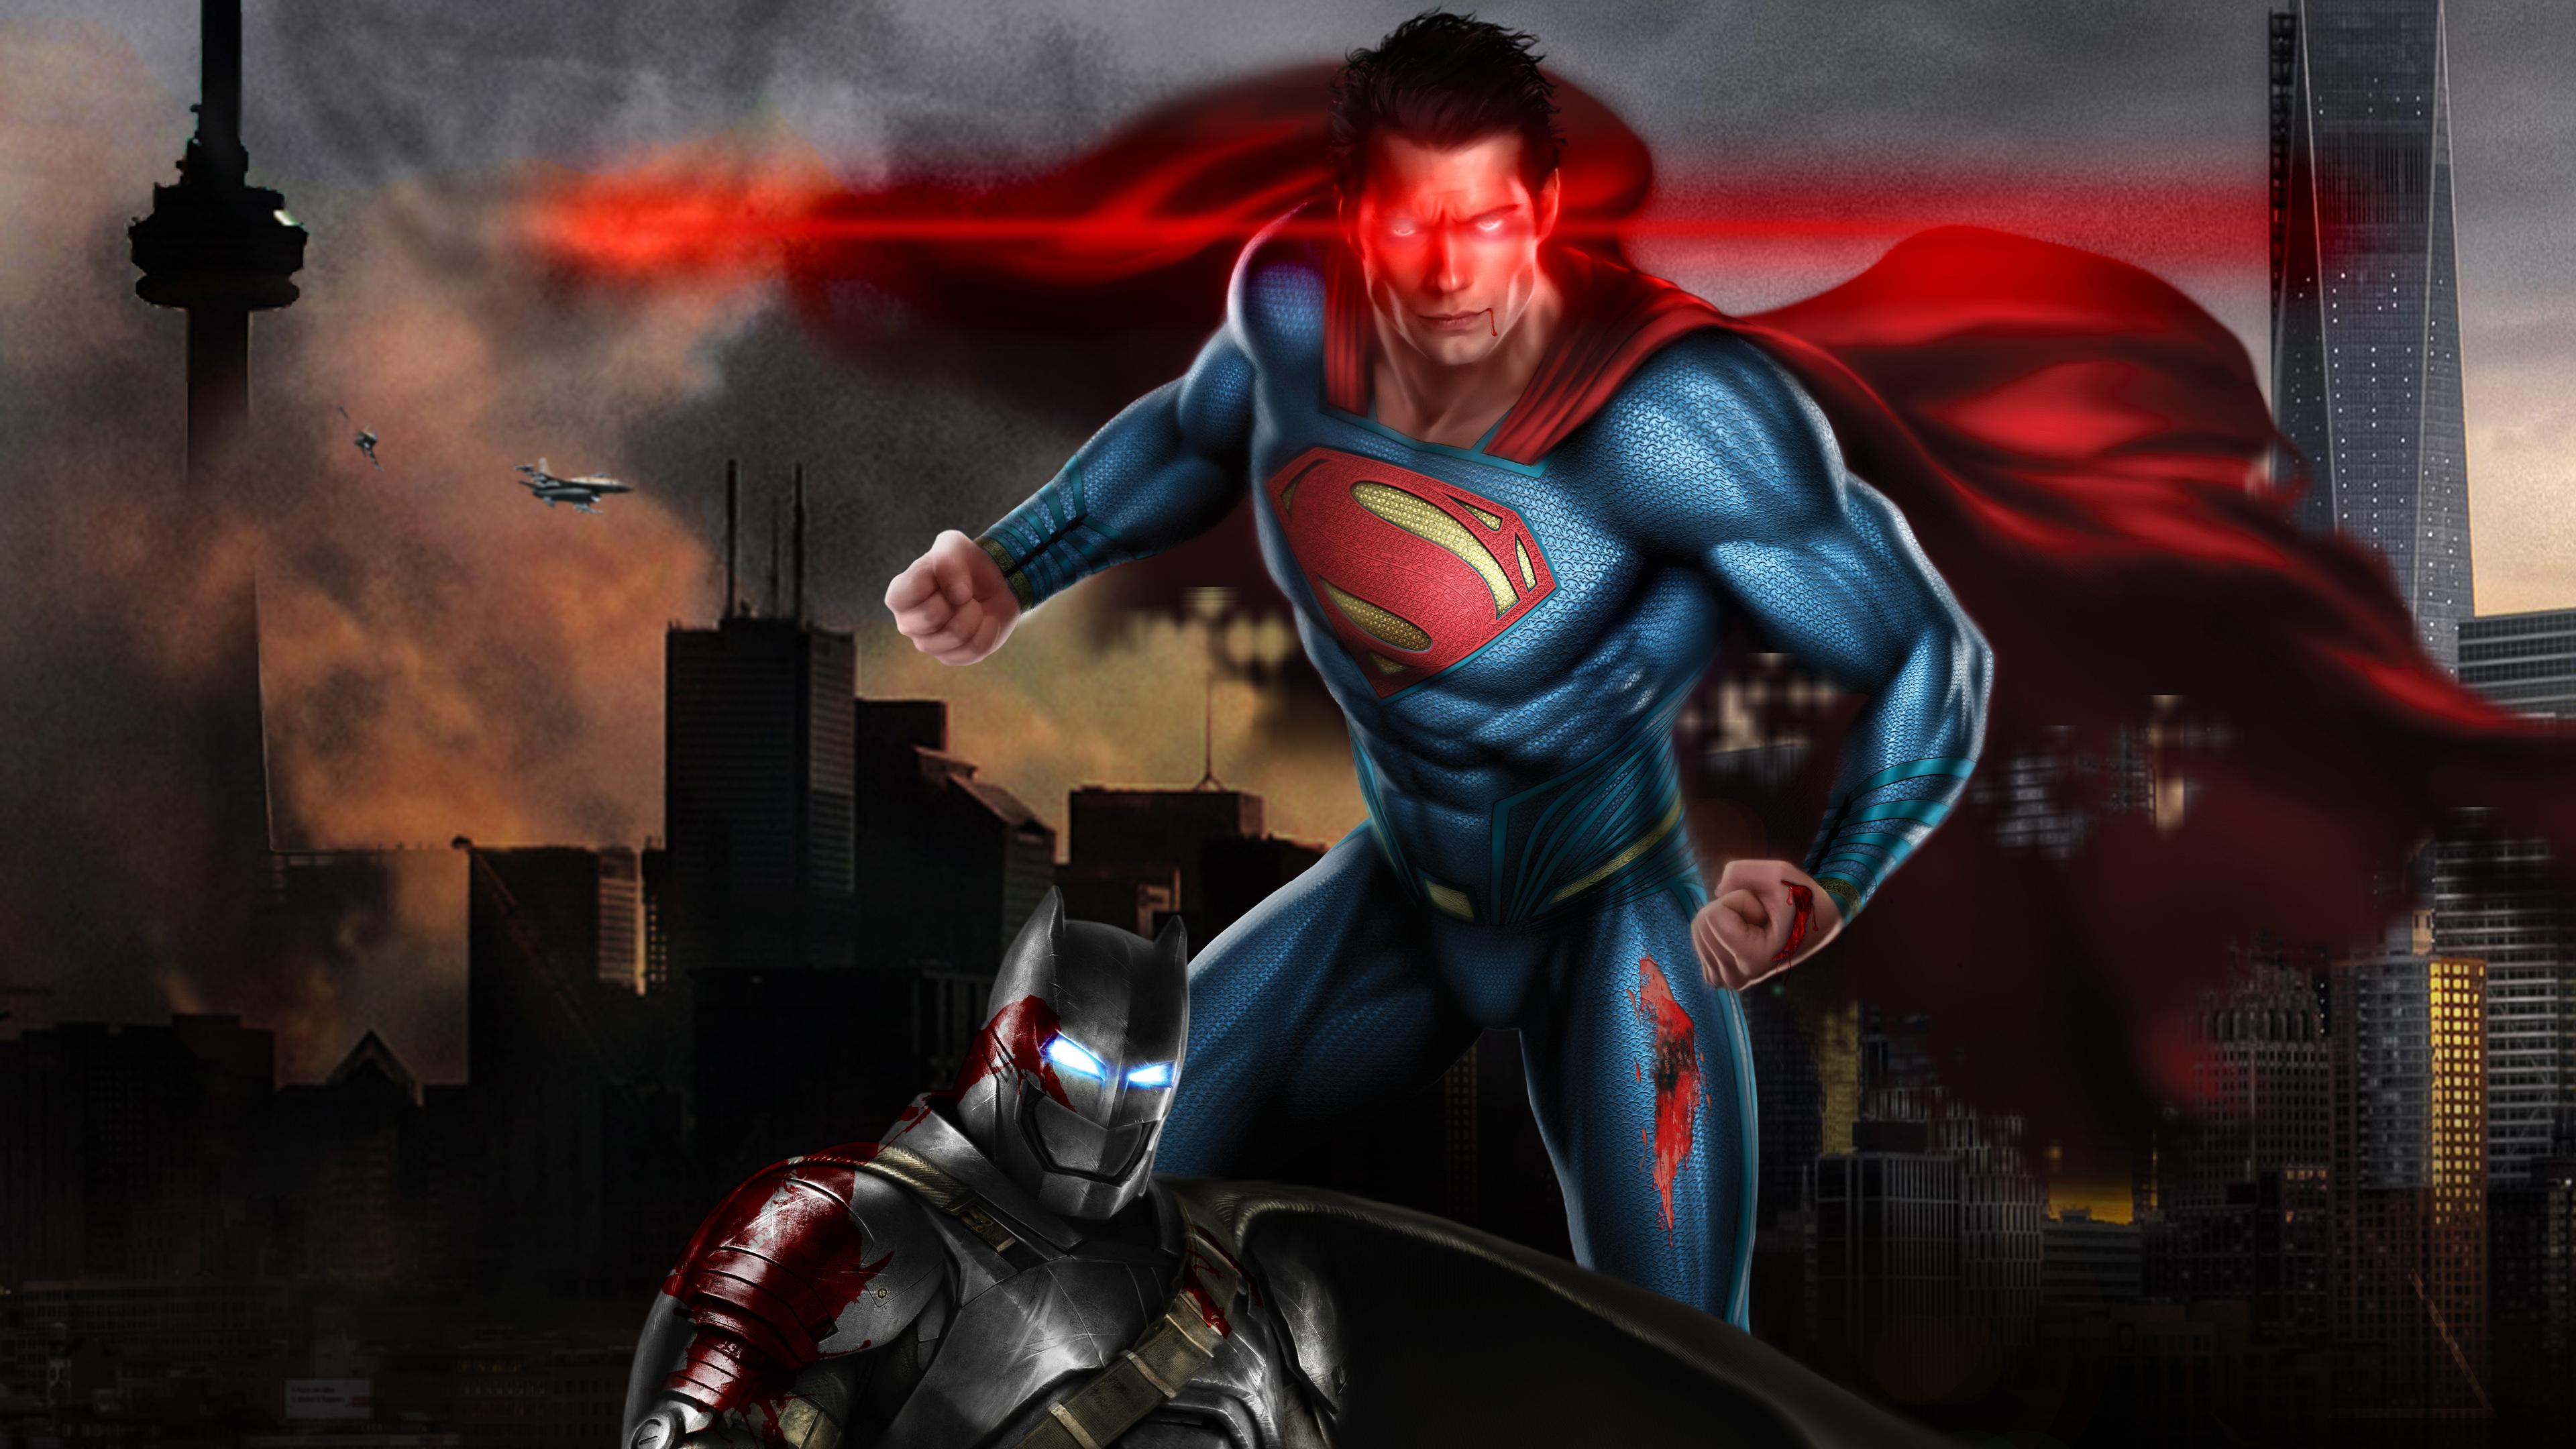 superman vs batman 5k art 1536522791 - Superman Vs Batman 5k Art - superman wallpapers, superheroes wallpapers, hd-wallpapers, digital art wallpapers, batman wallpapers, artwork wallpapers, artist wallpapers, 5k wallpapers, 4k-wallpapers